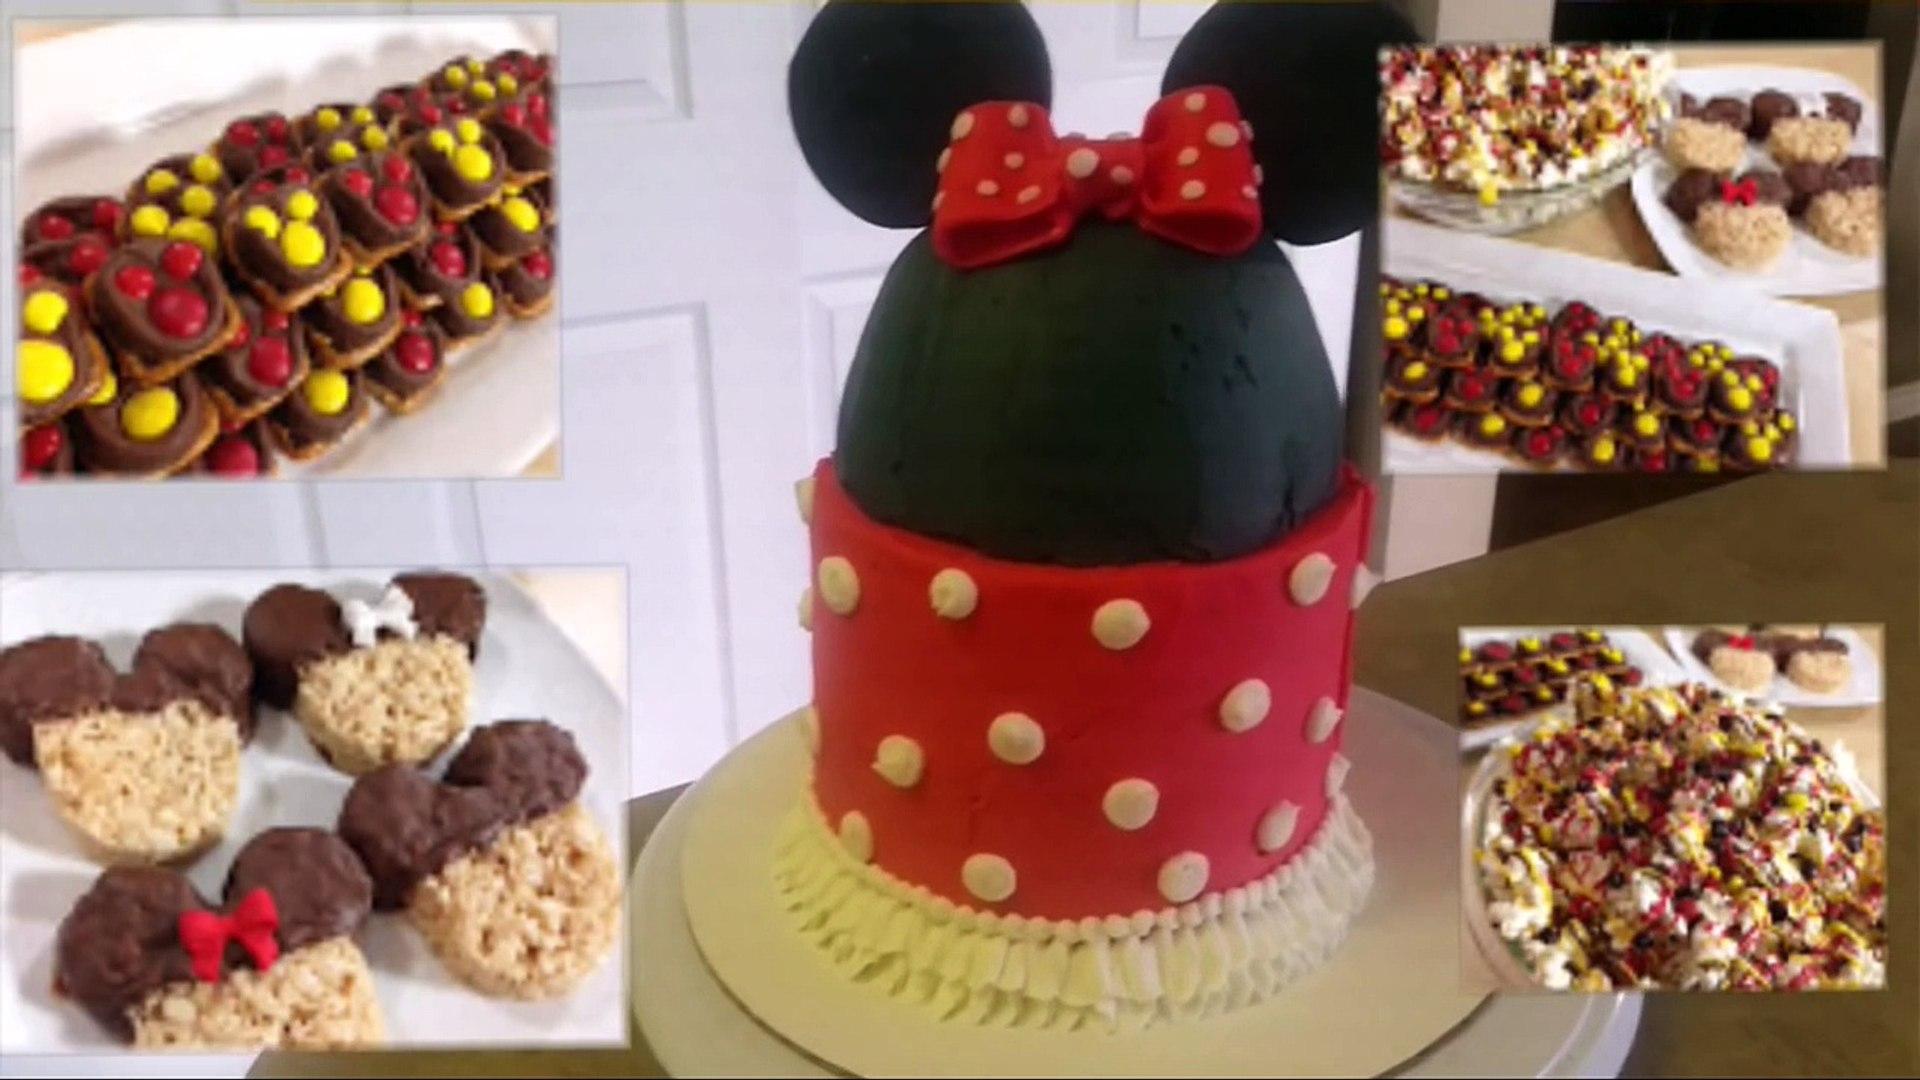 MICKEY / MINNIE MOUSE CAKE. Cake Decorating